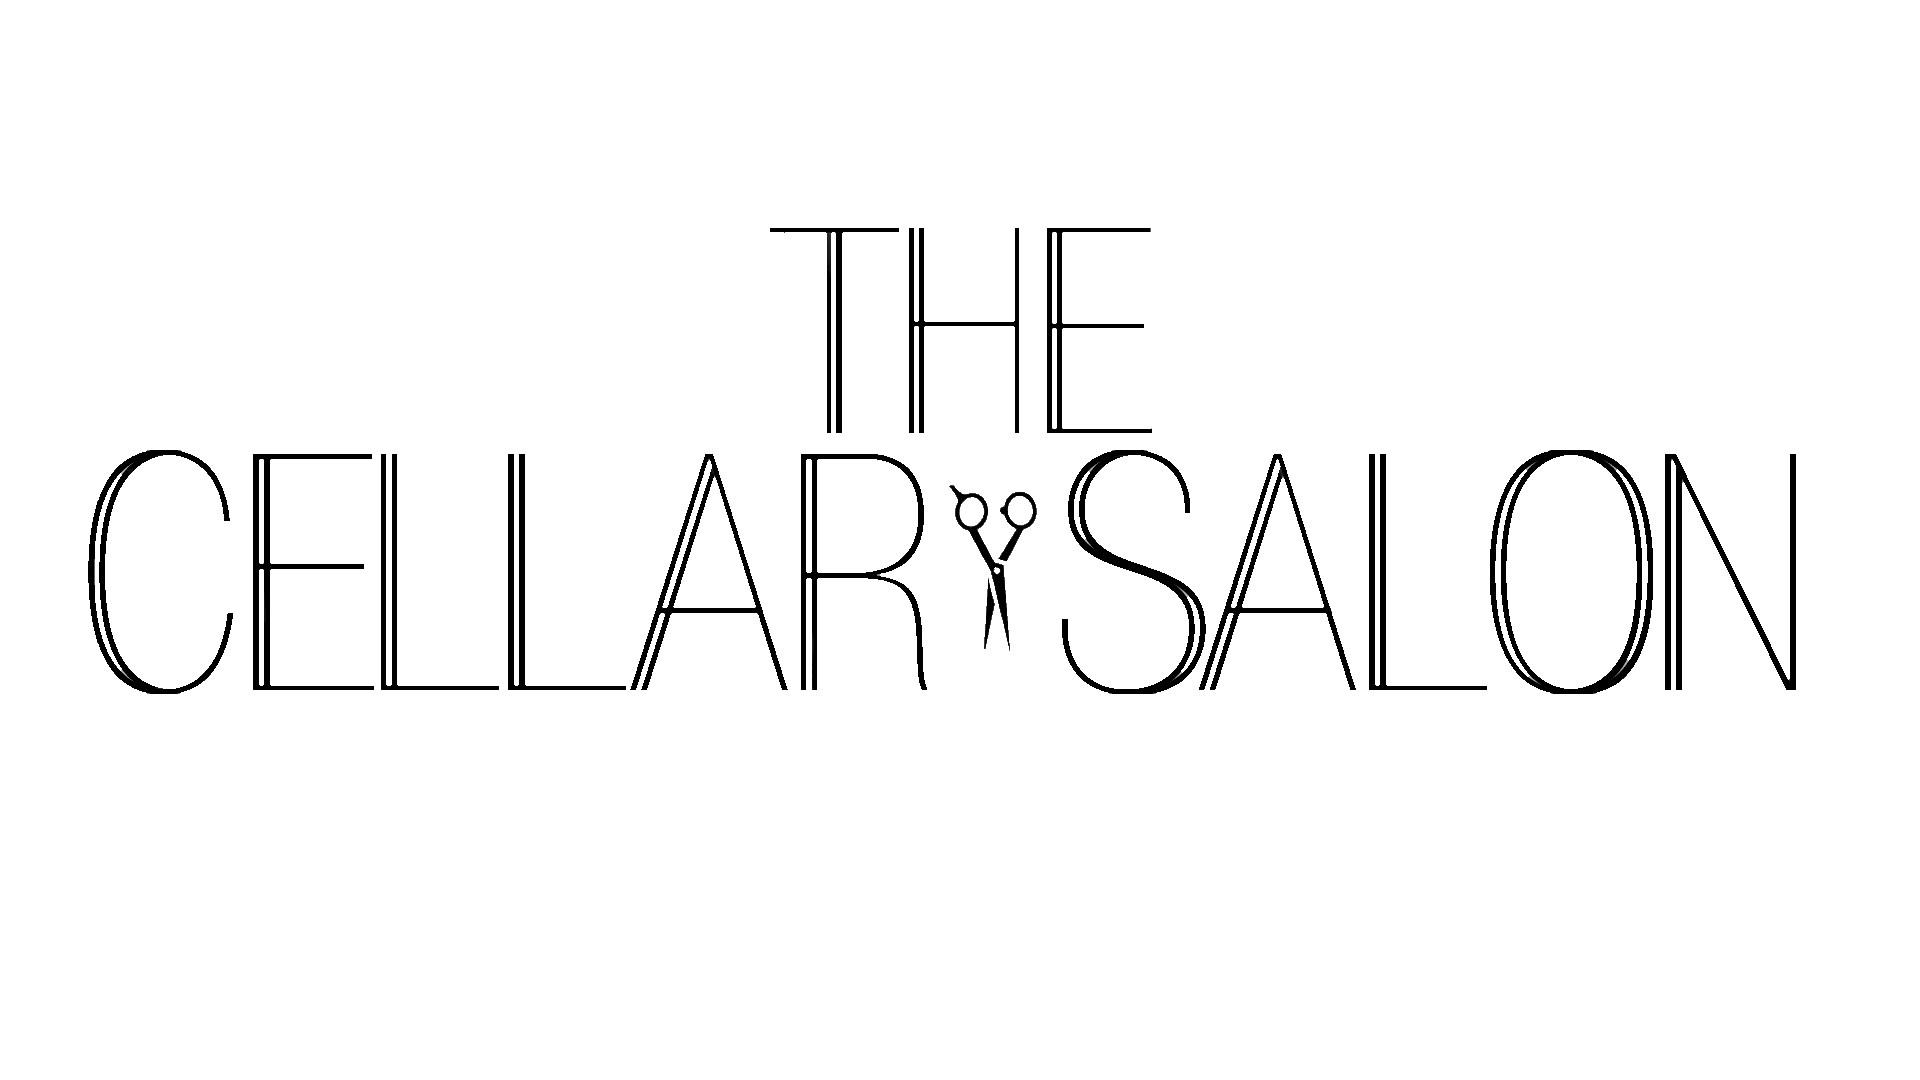 The Cellar Salon